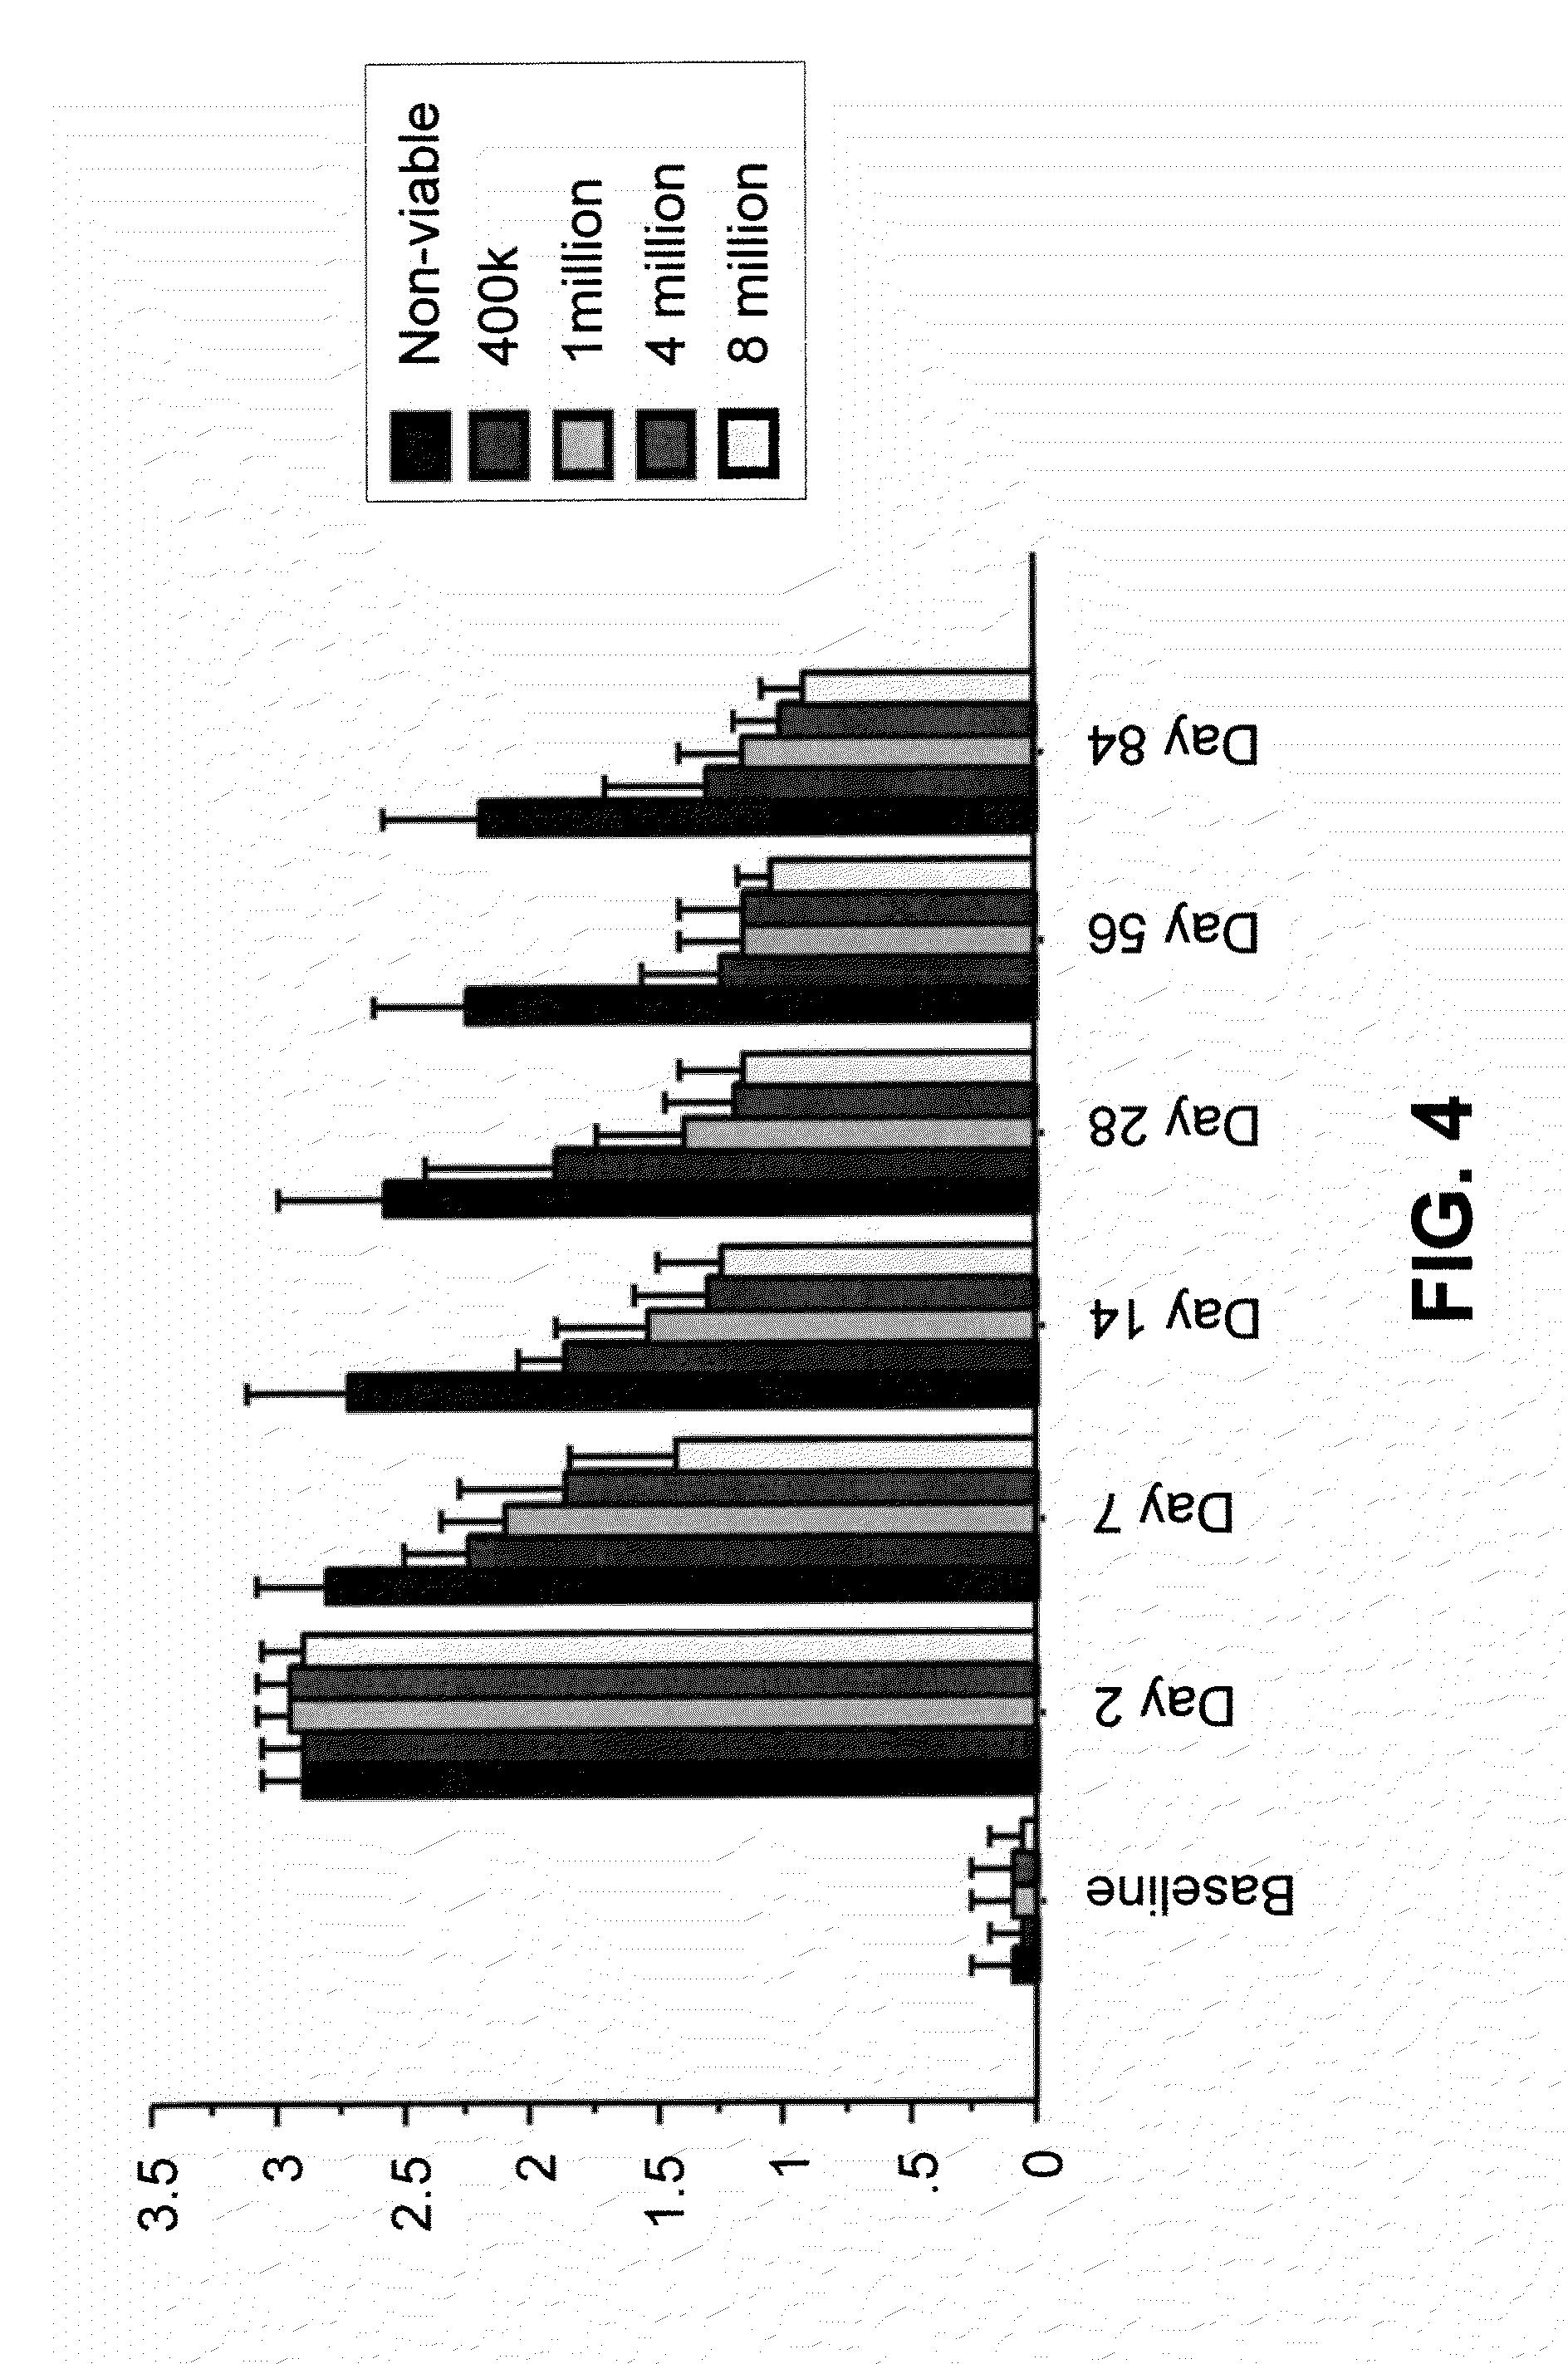 Improving cognitive function bipolar image 4